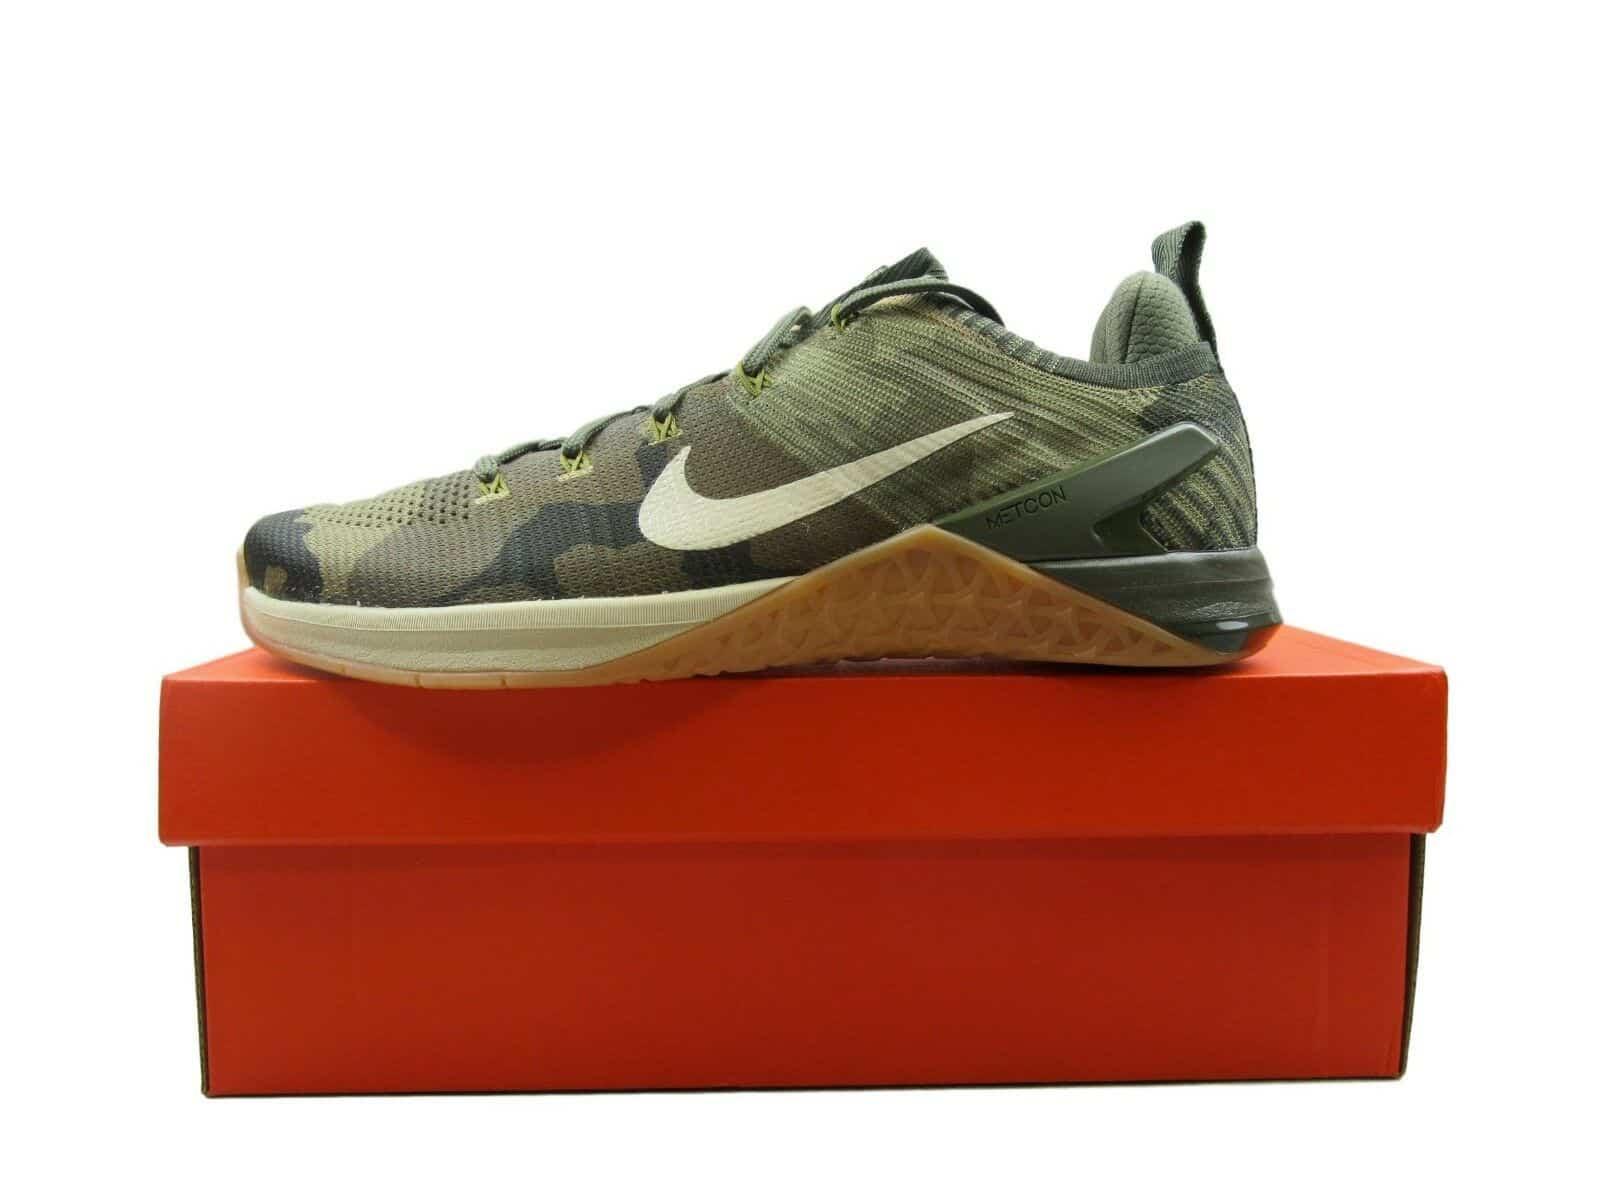 brand new 1f42b fb93d nike-metcon-dsx-flyknit-2-mens-training-shoes-